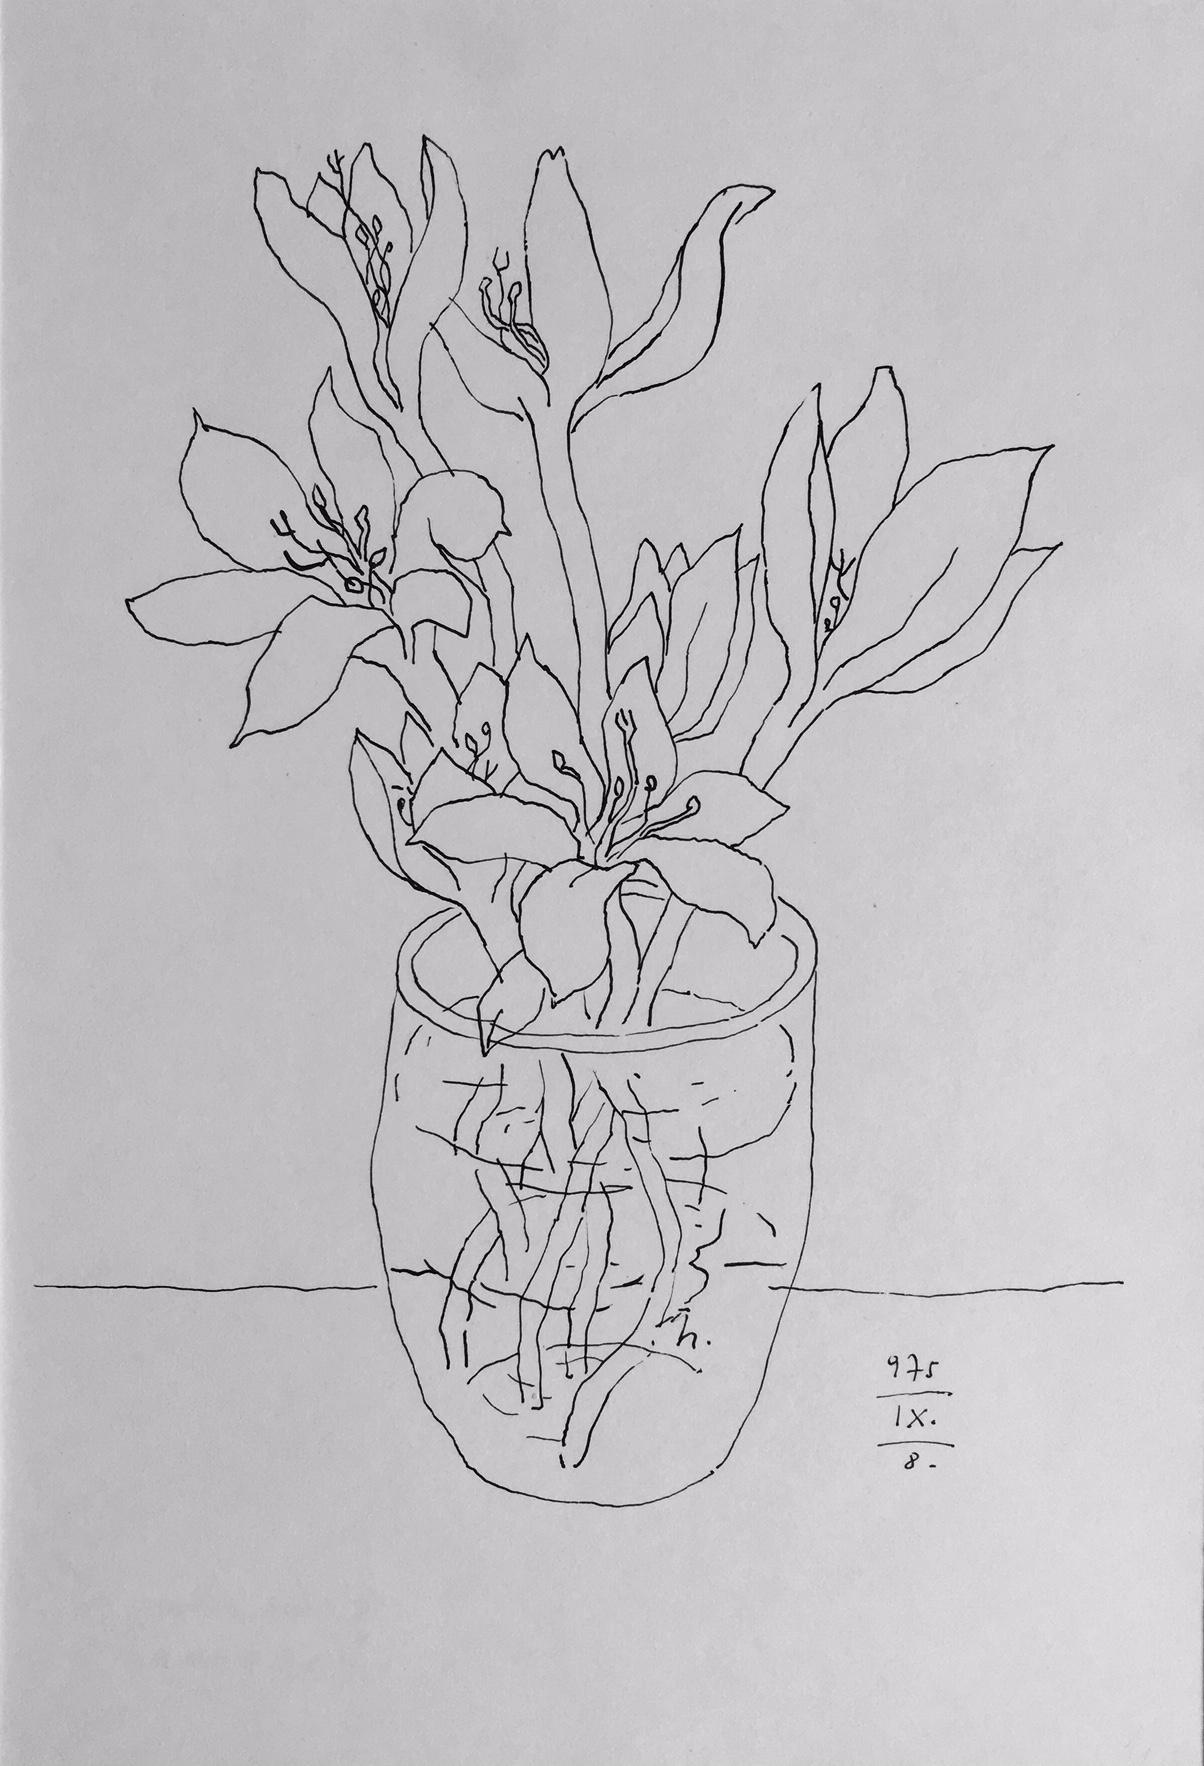 Reich, Károly: Blumen